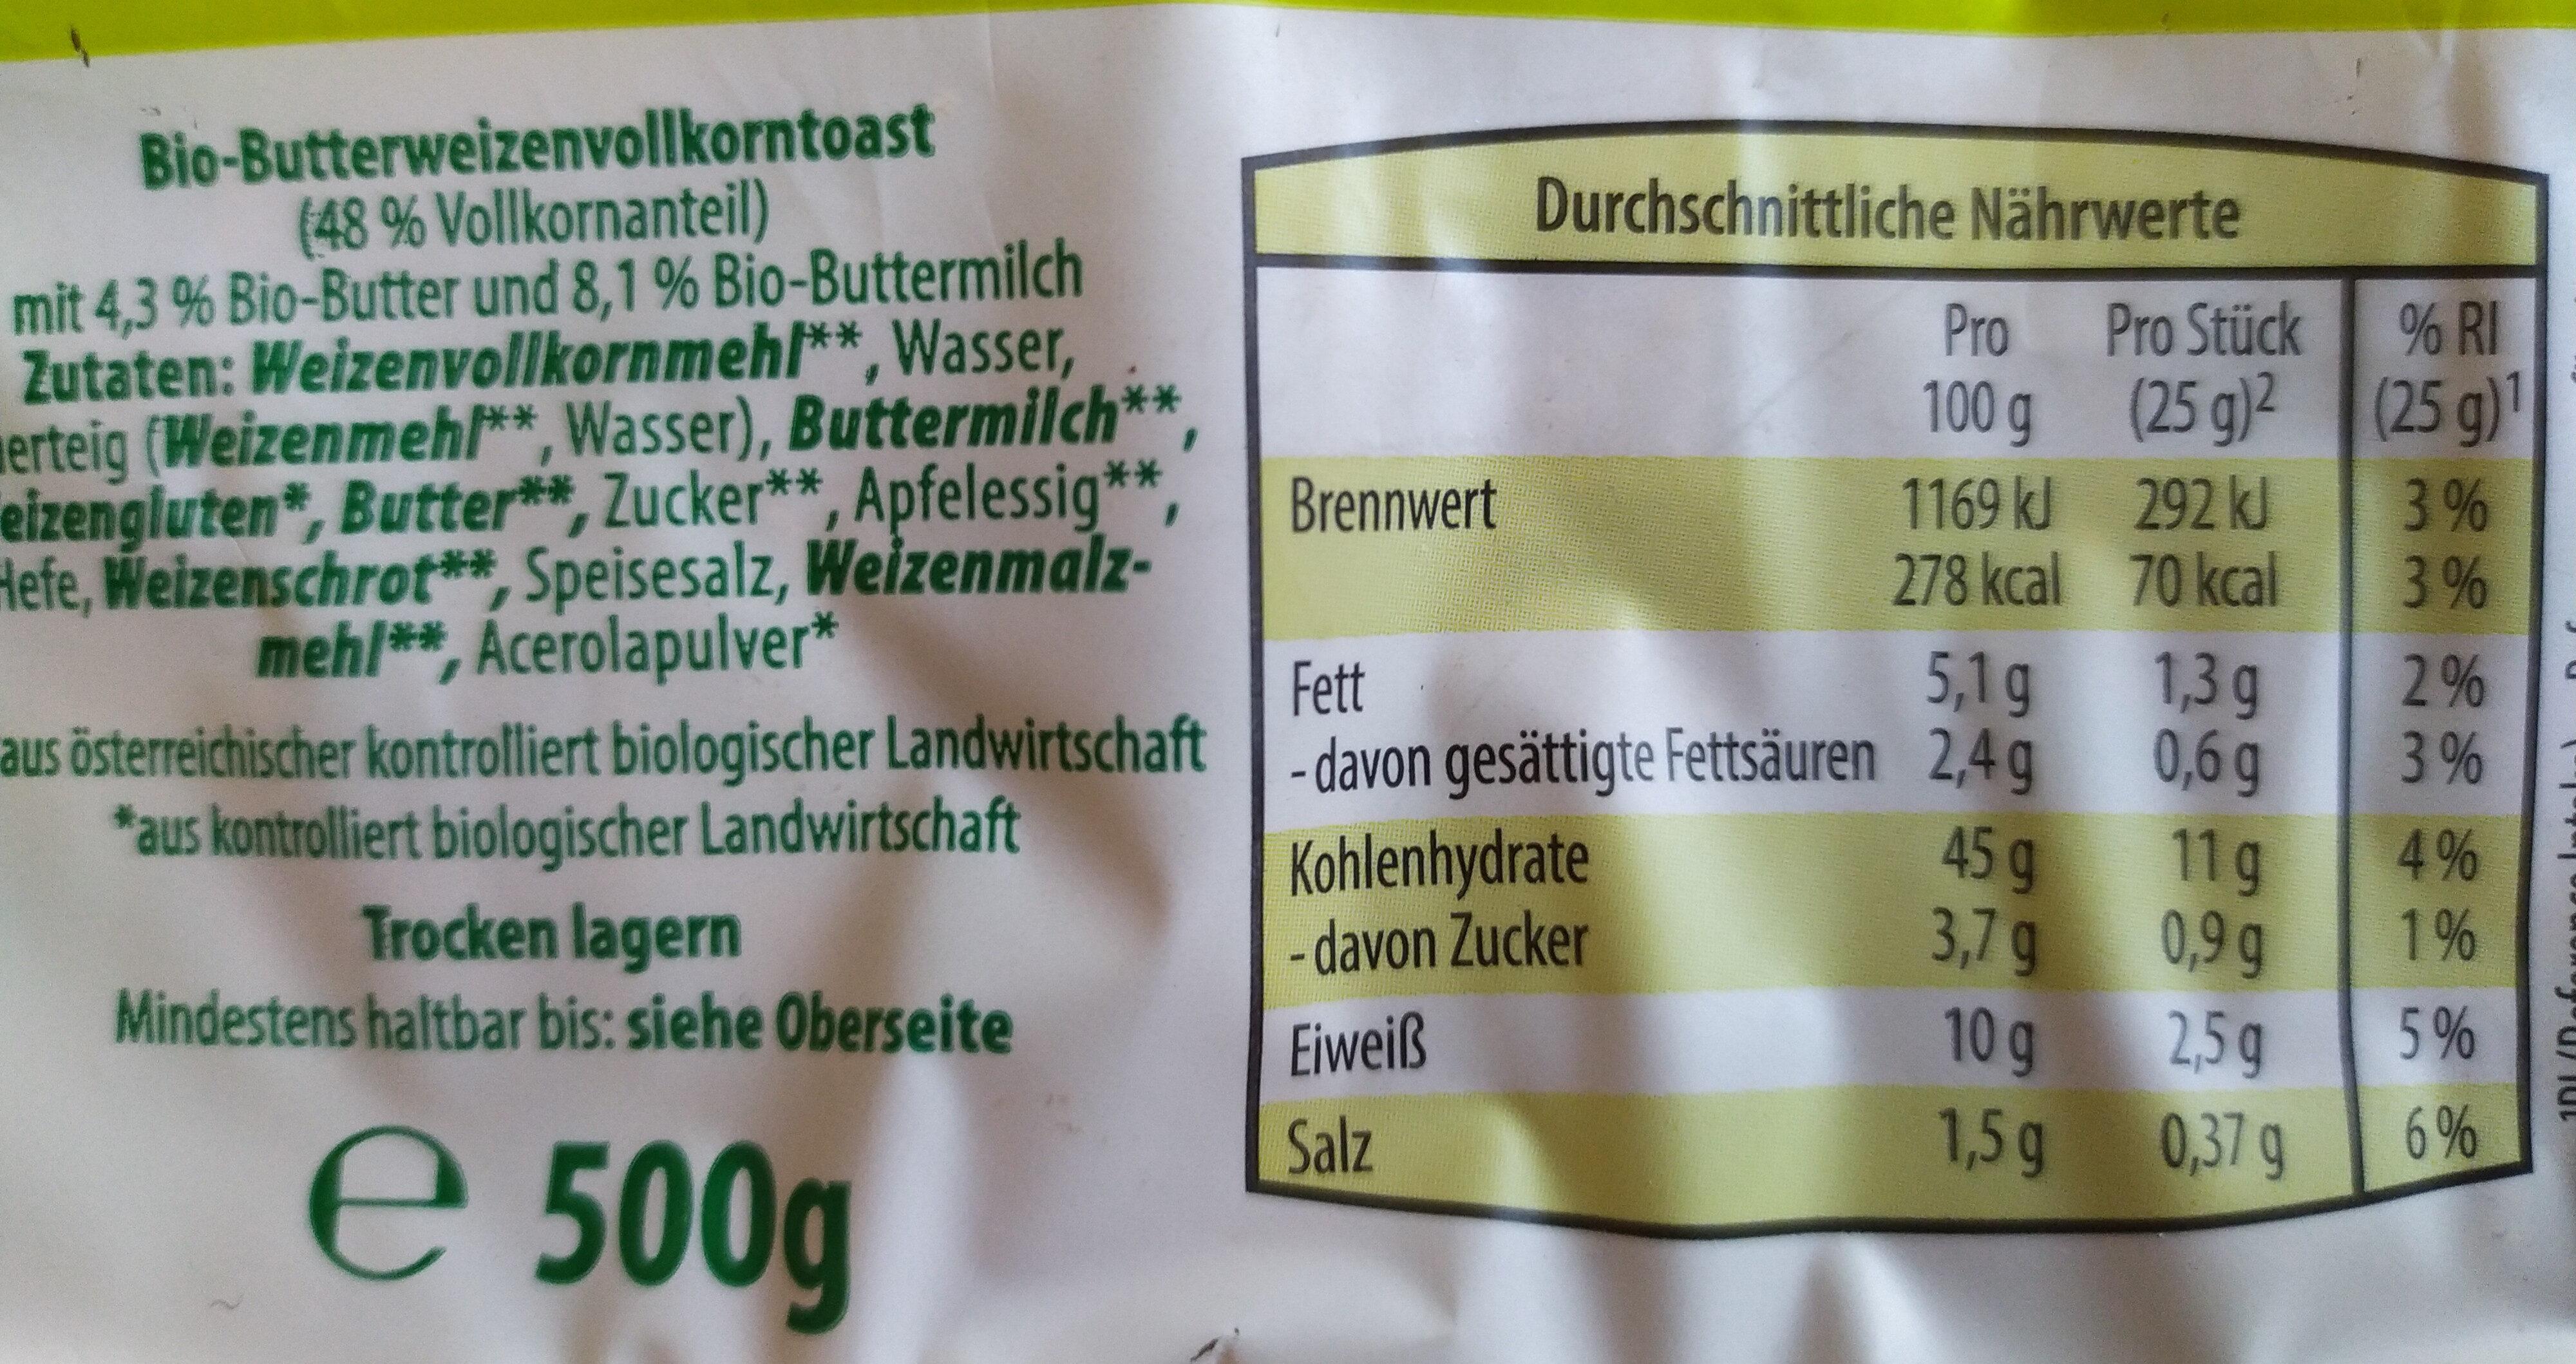 Vollkorn-Buttertoast - Ingredients